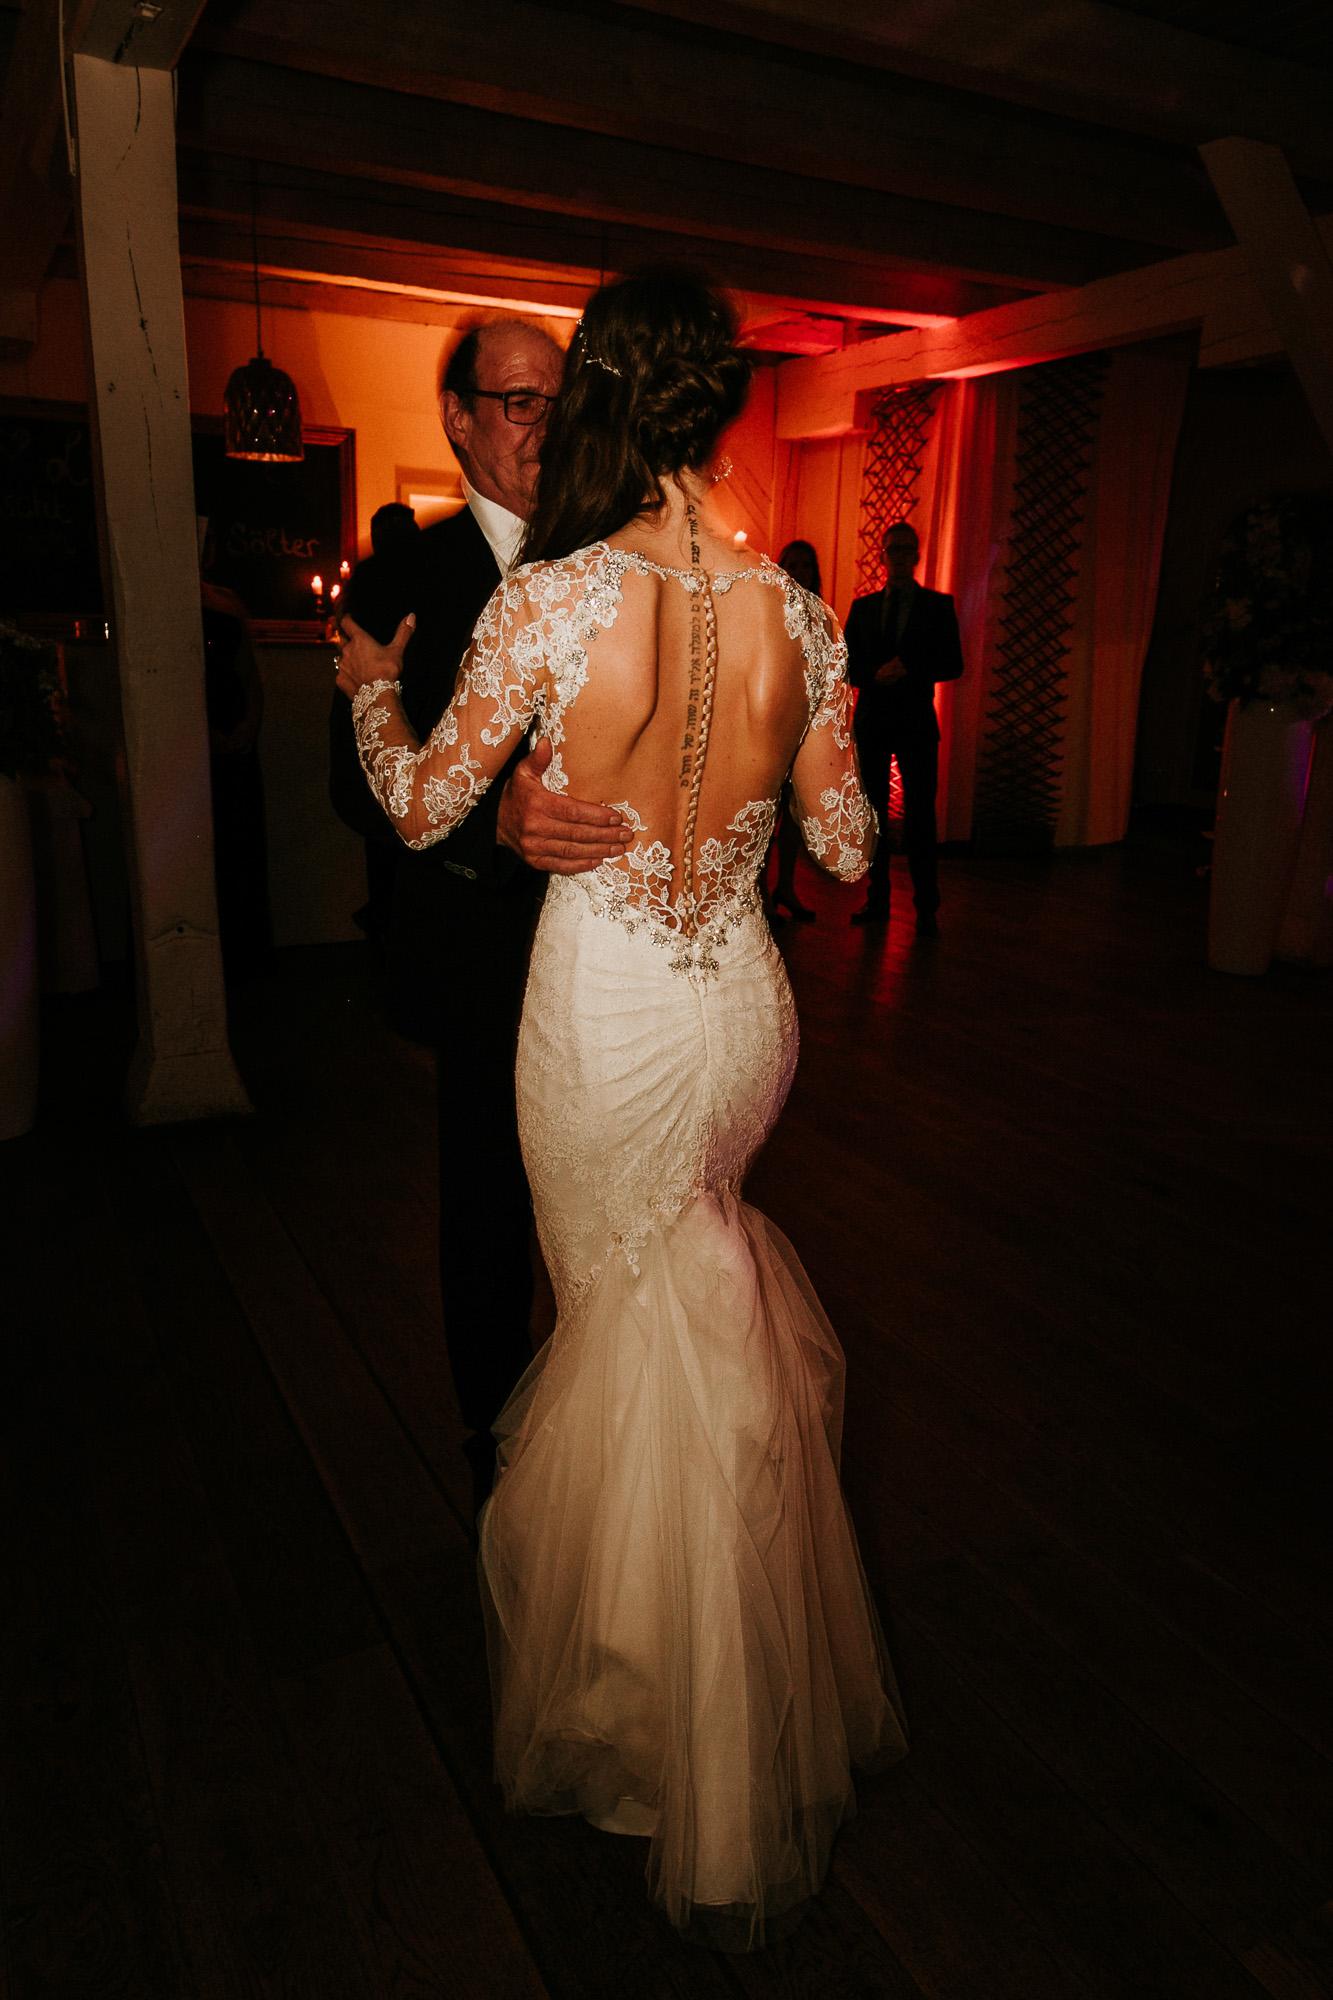 DanielaMarquardtPhotography_Hochzeitsfotograf_Düsseldorf_Köln_Mallorca_Bayern_Austria_Harz_Wedding_AileenundLennart_Weddingphotographer_Ibiza_Tuskany_Italien_Toskana_Portugal_Lissabon273